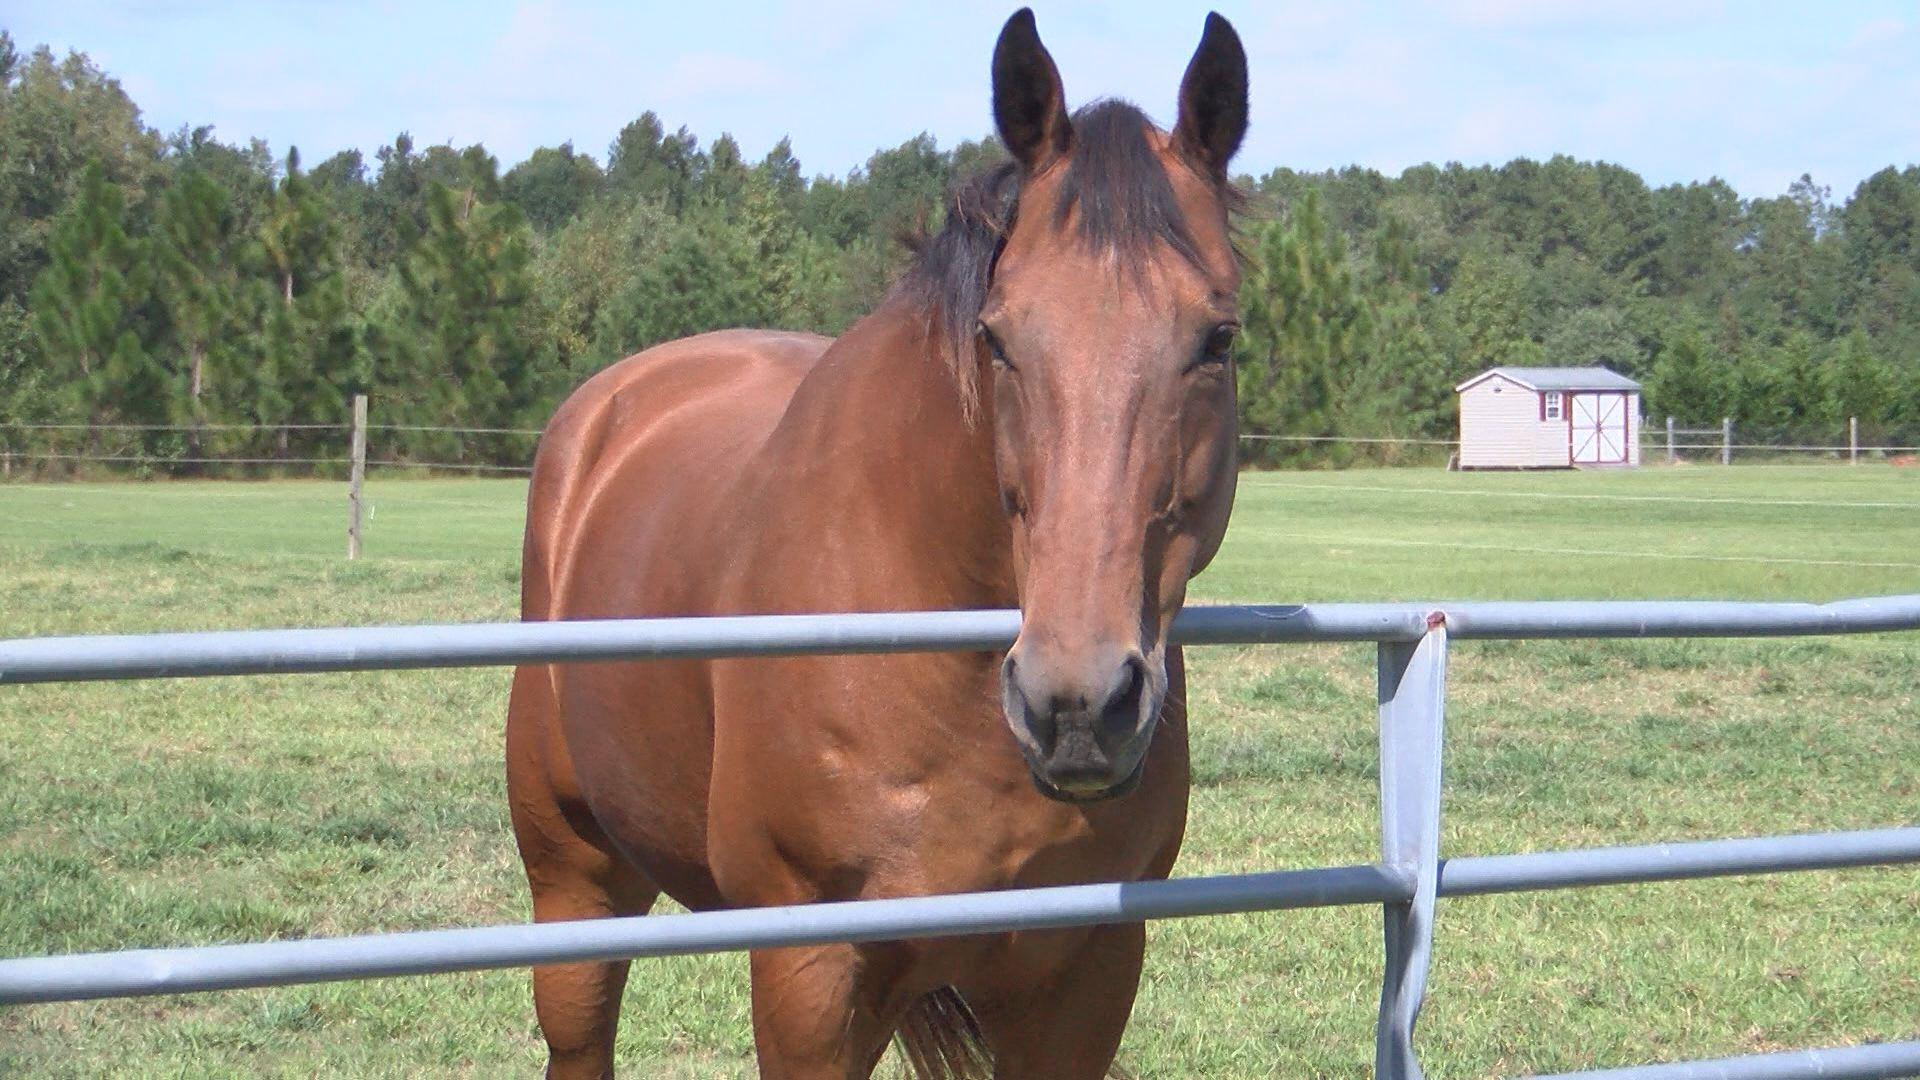 HORSE_474642